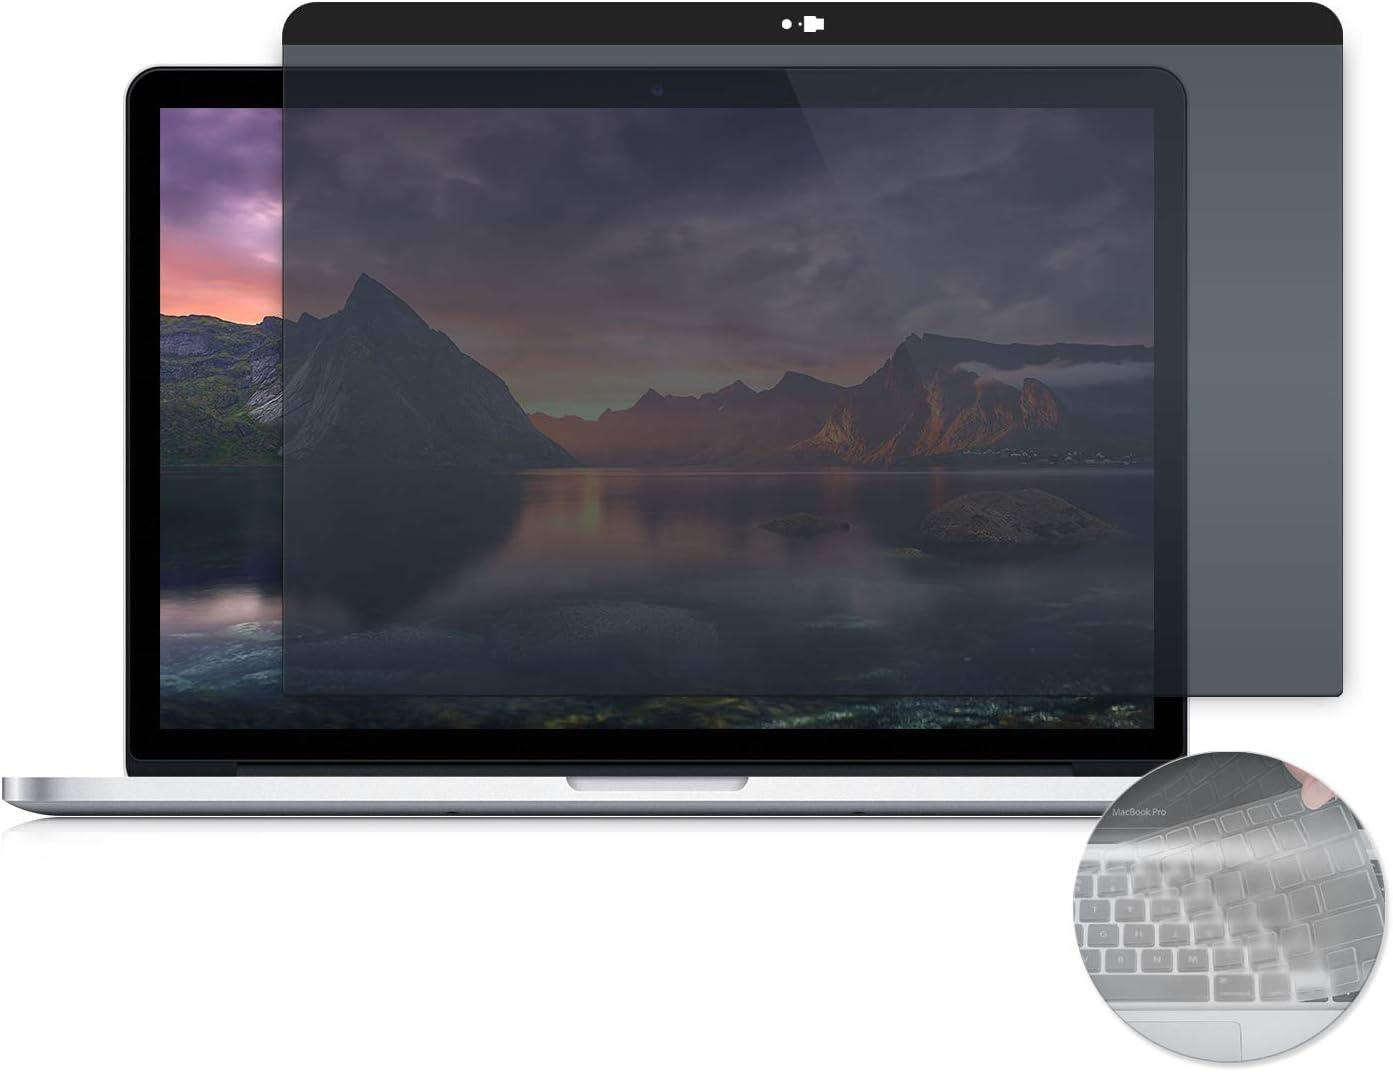 Adaptix MacBook Compatible Blue Light Screen Filter Protector 15 Magnetic Privacy Screen for MacBook Pro Anti-Glare Blocks 96/% UV Late 2012-2015 AMSMR15 Anti-Scratch